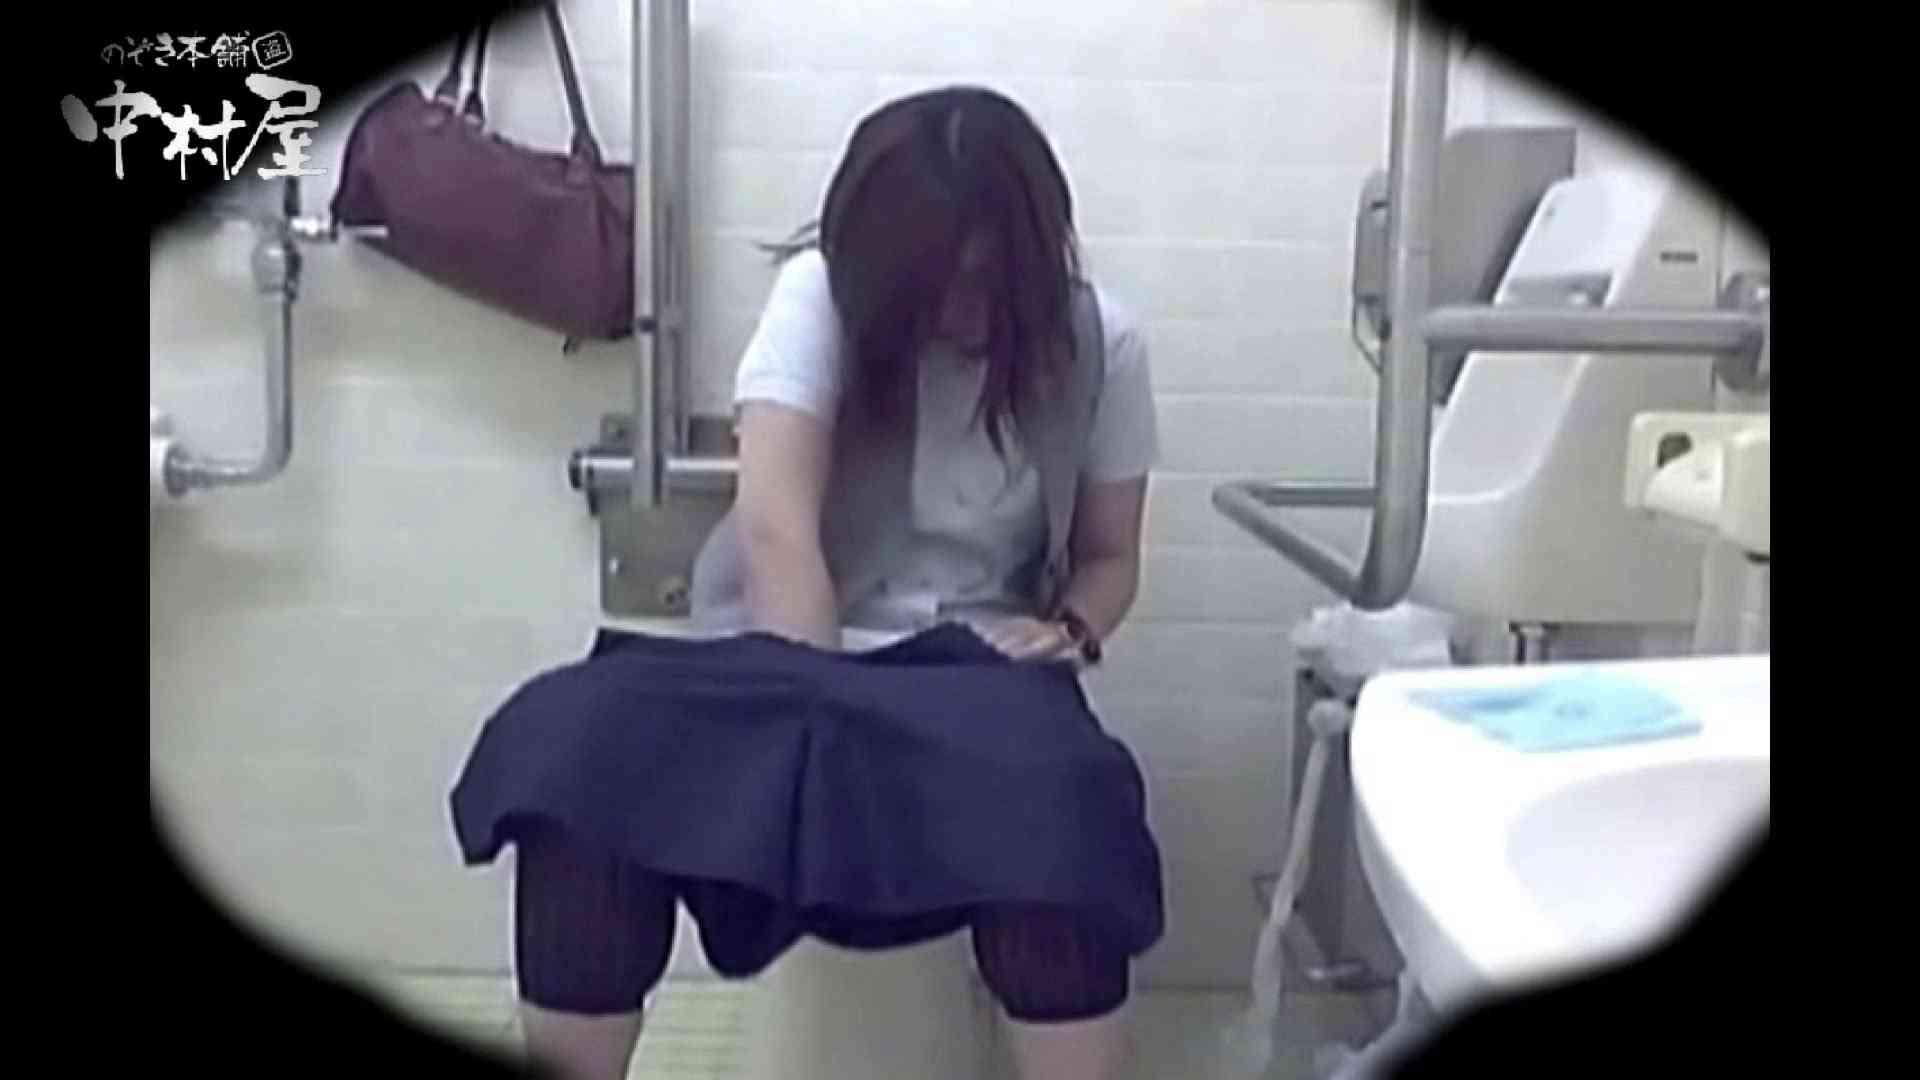 teen galトイレ覗き紙がナイ編‼vol.12 浴衣 ワレメ動画紹介 96PIX 20